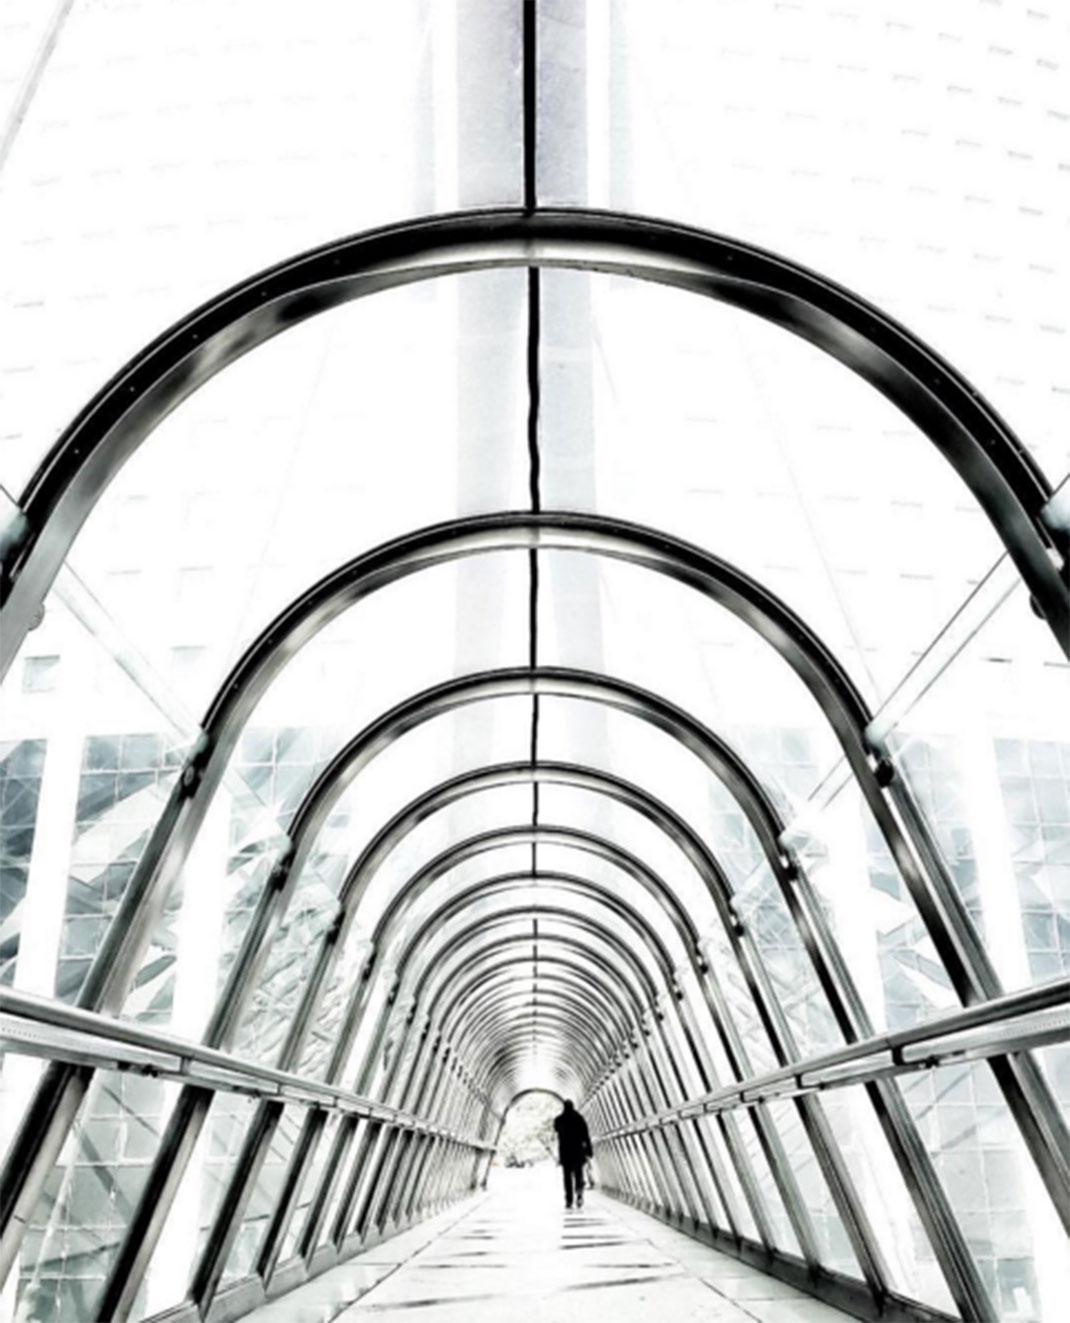 11-architecture-symetrie